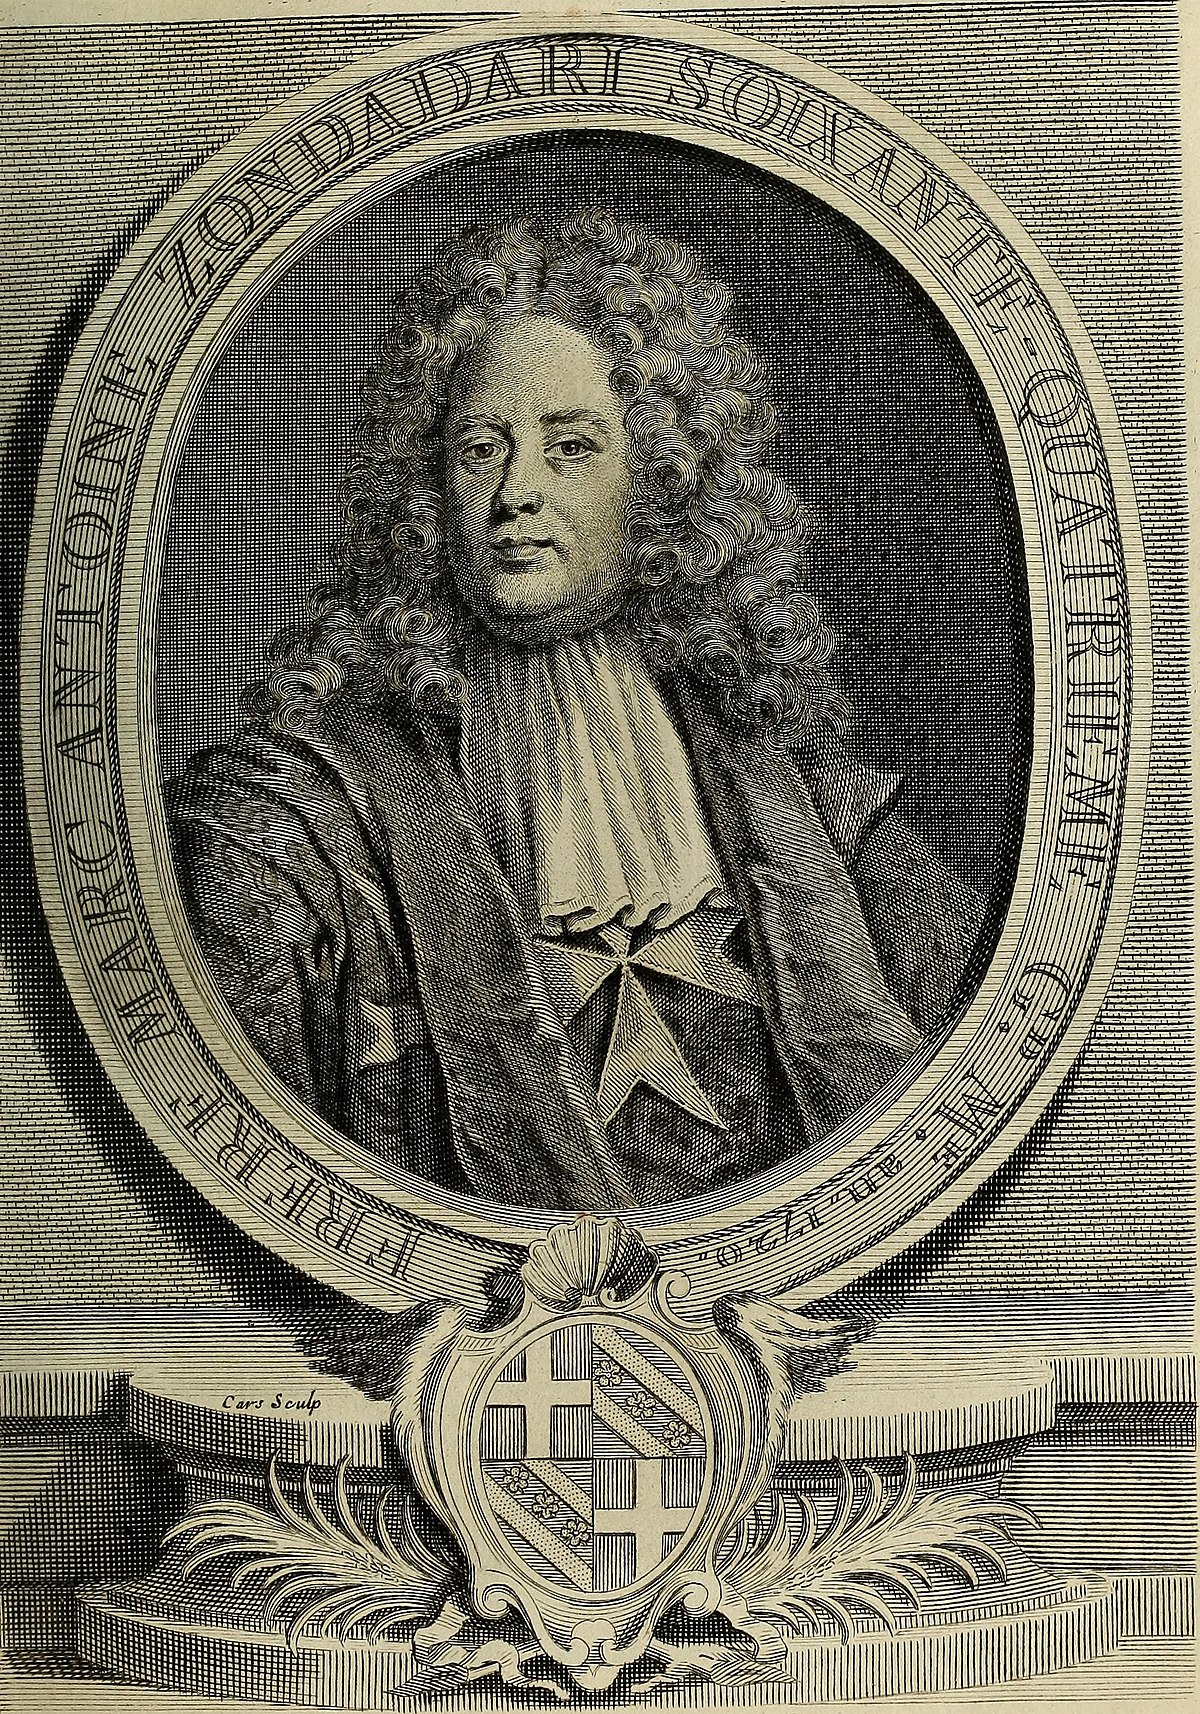 Marc 39 antonio zondadari wikidata Histoire des jardins wikipedia